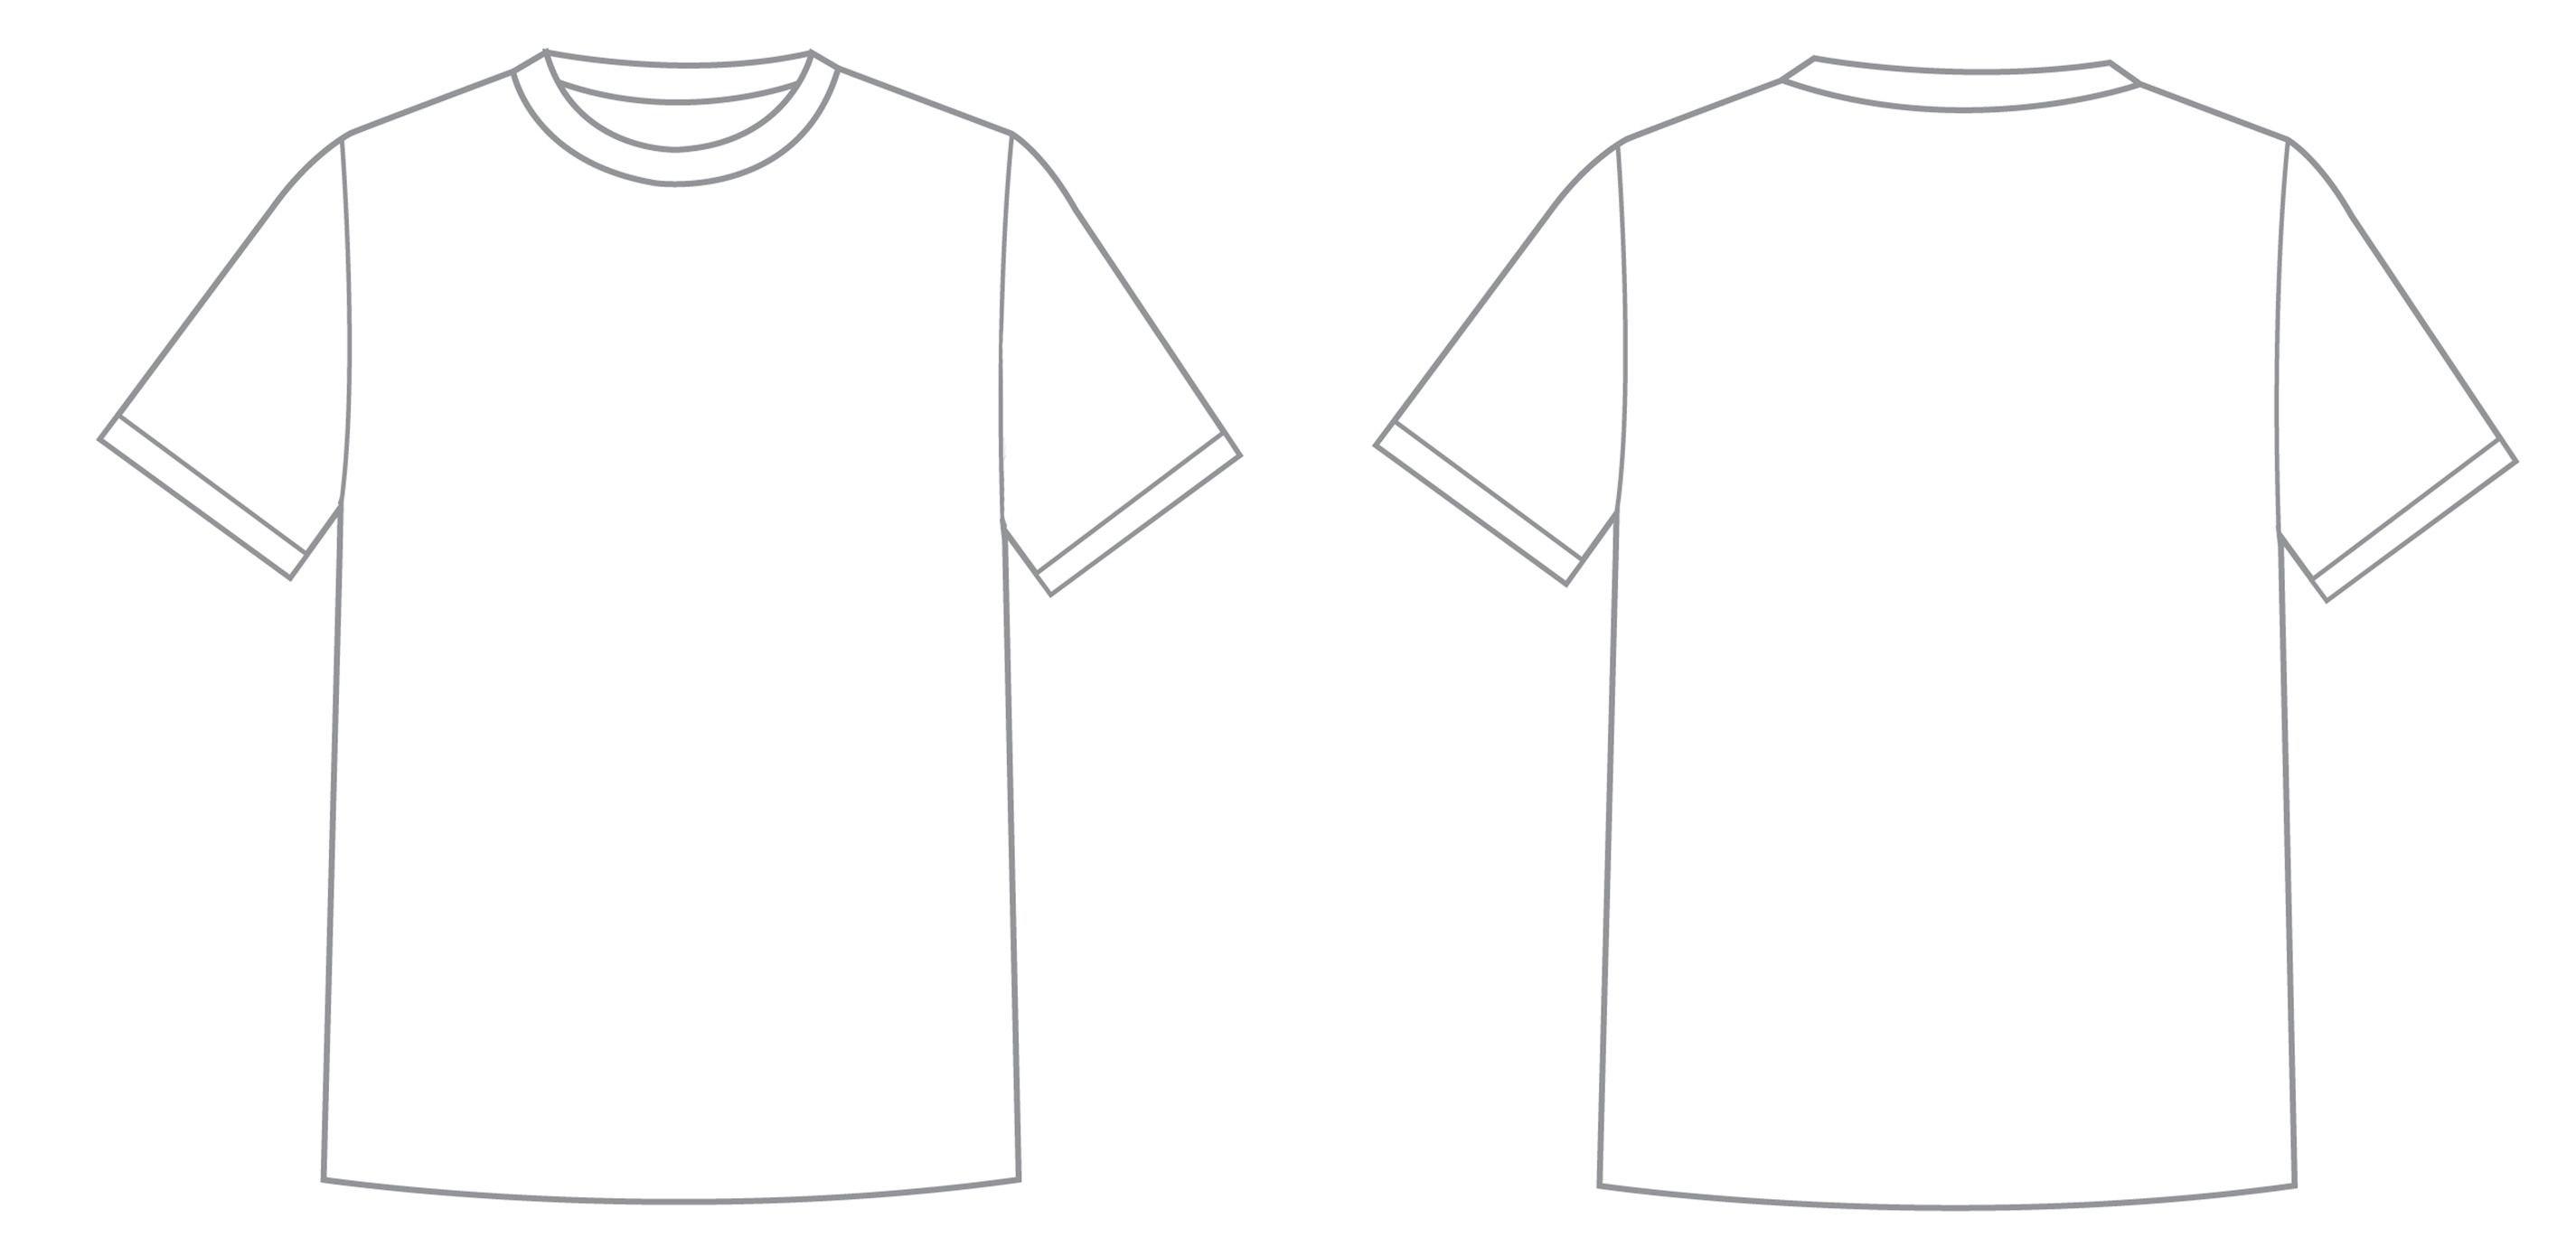 Pinoindy On Inspiration Idea  Shirt Template T Shirt Design Inside Blank Tshirt Template Printable